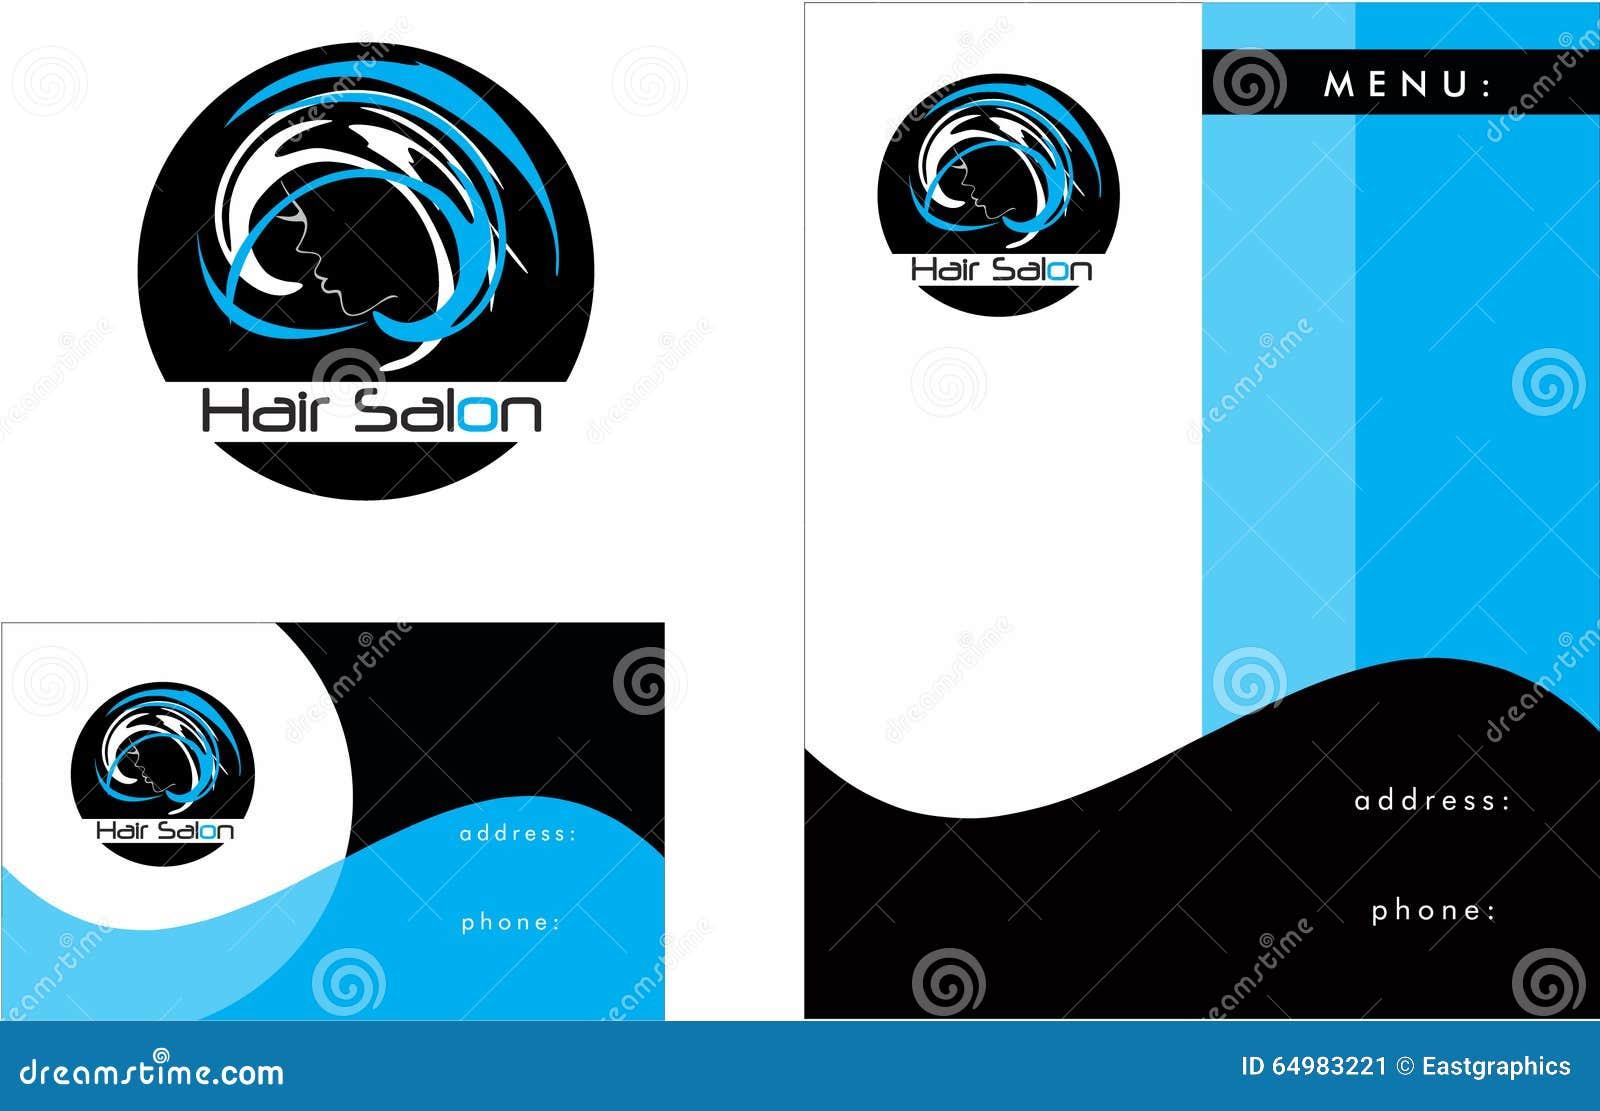 Hair Salon Modern Logo, Business Card 2 X 3.5, Flyer 4.25 X 5.5 ...